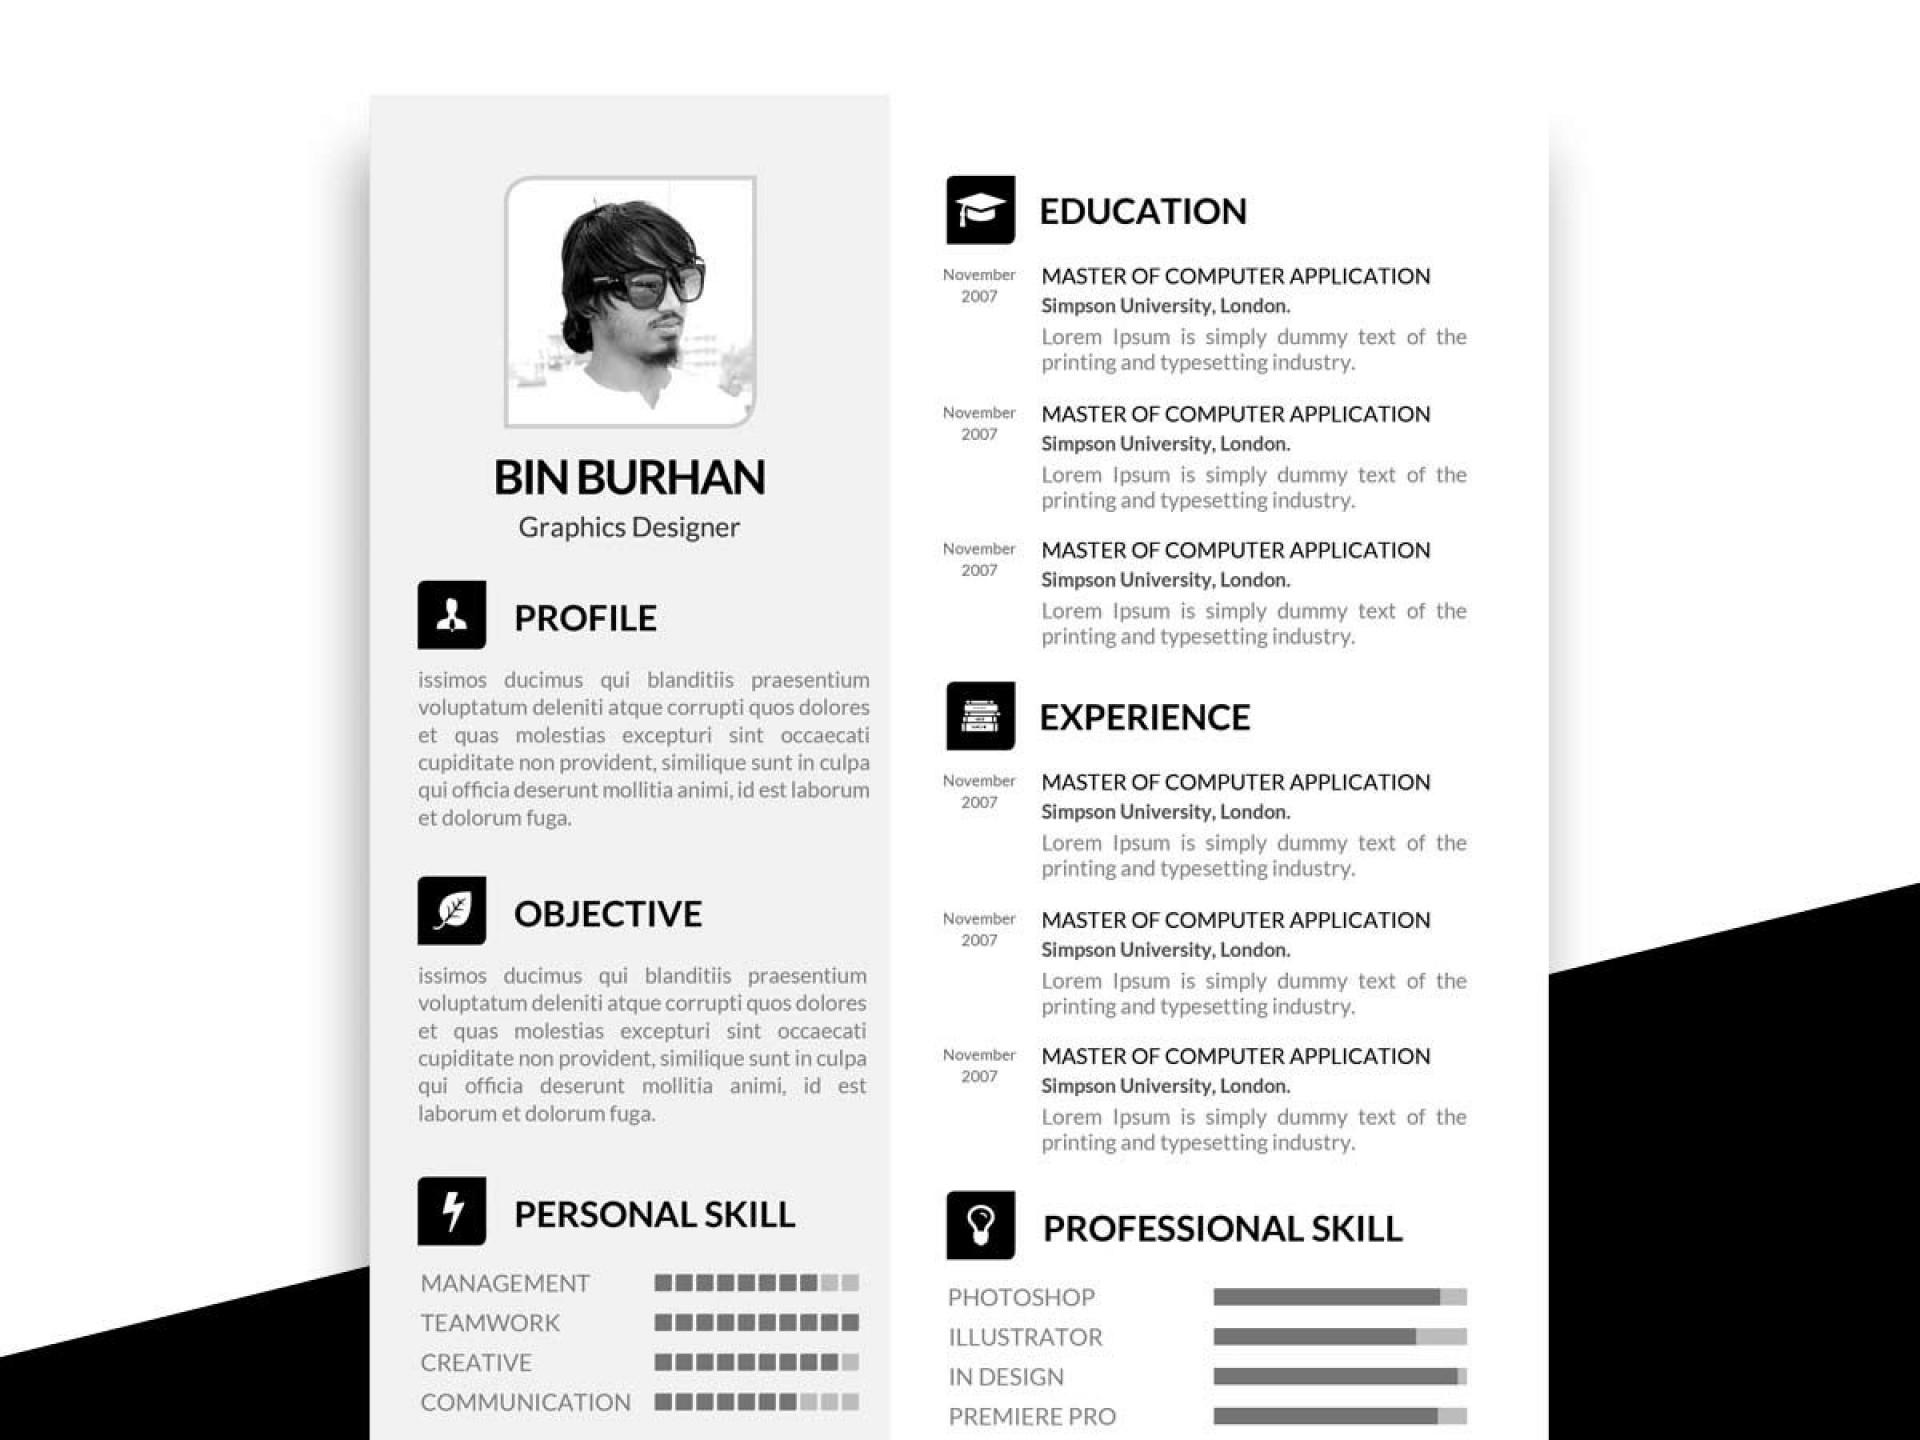 007 Top Psd Resume Template Free Download Photo  Graphic Designer Creative Cv1920